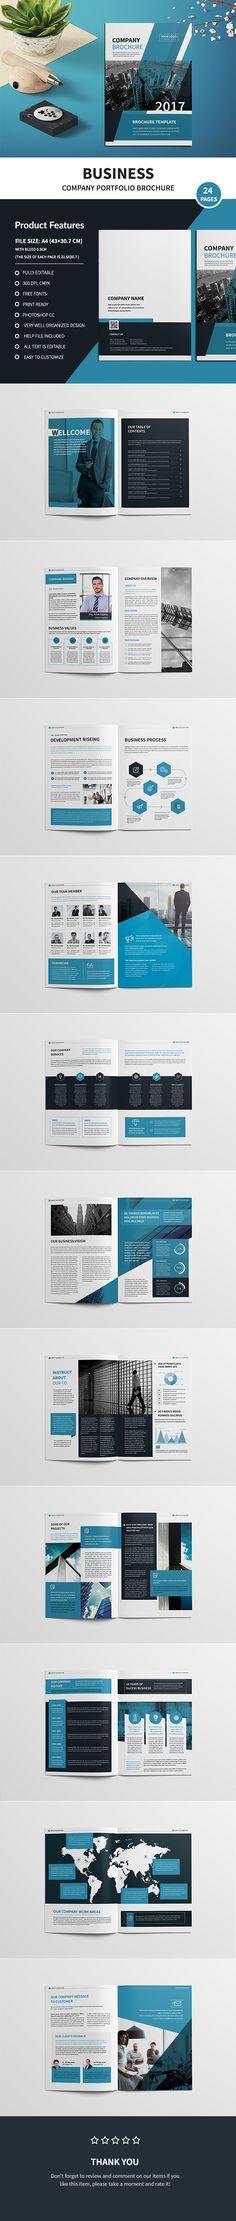 Company Profile Company profile, Photoshop and Profile - company profile